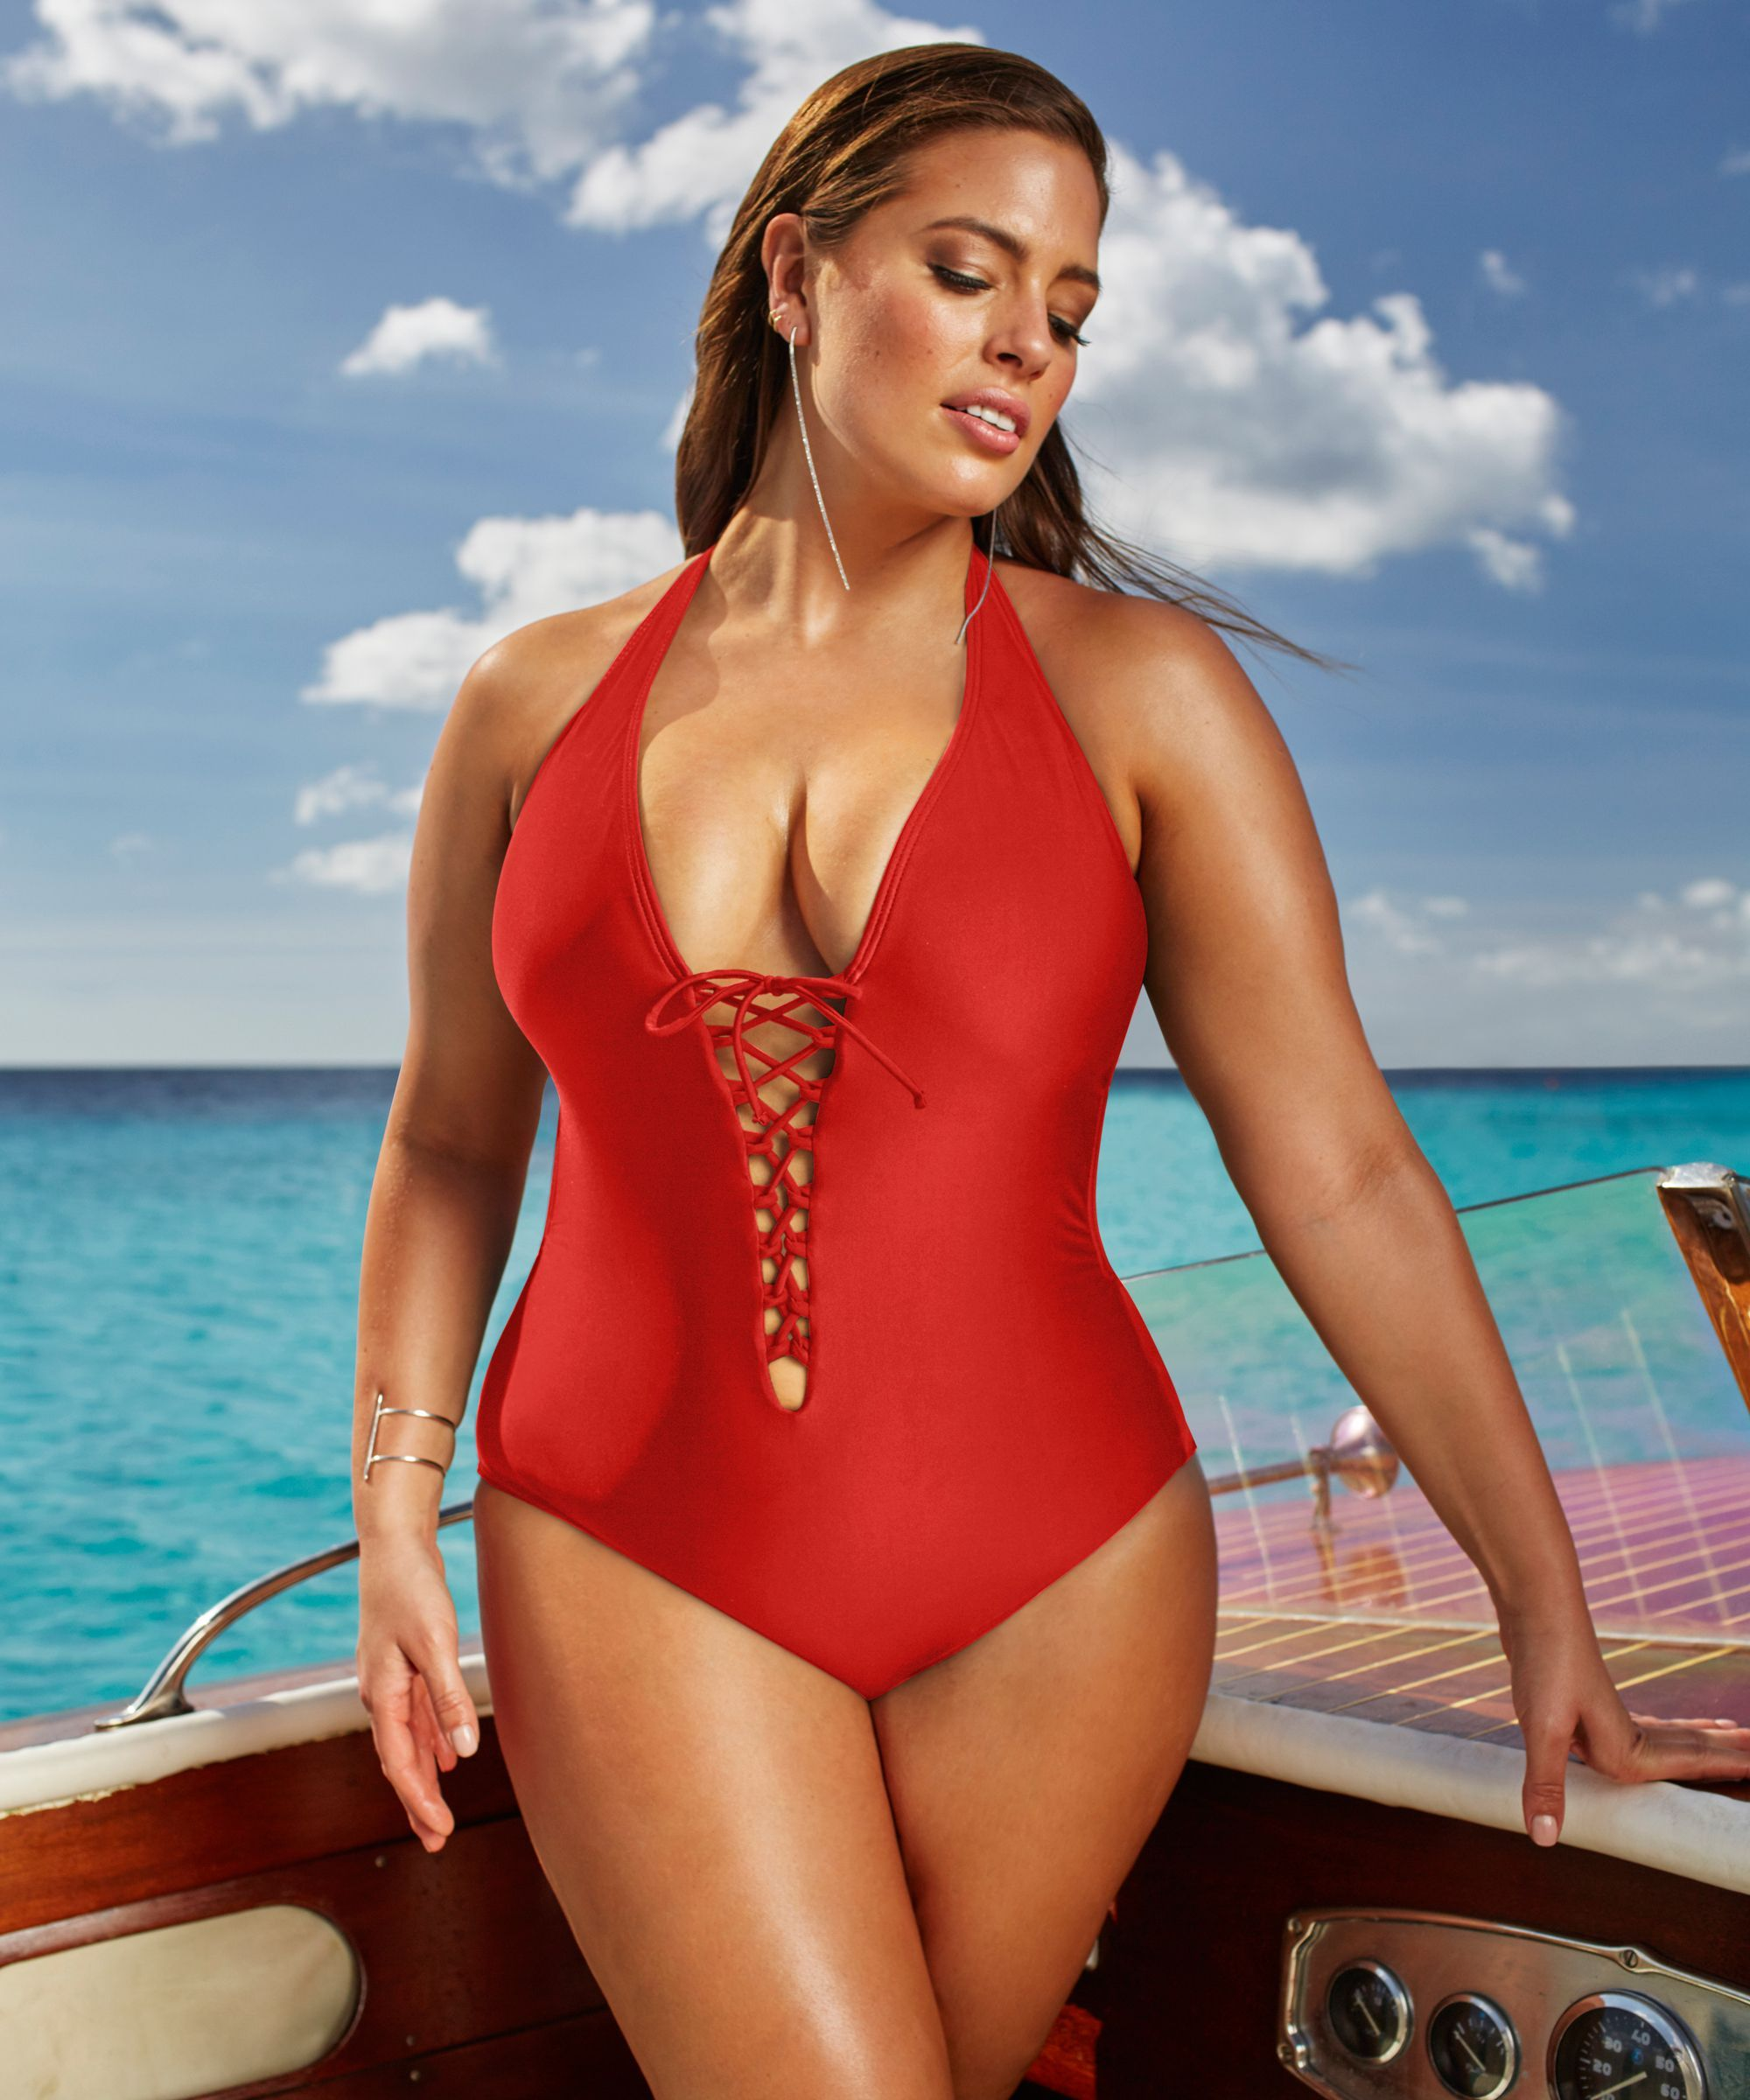 75e3fe784a8 Plus Size Swimwear Female Polka Print One Piece Swimsuit Women Vintage  Bathing One-Piece Suits 2016 Retro Large Size Swimsuit